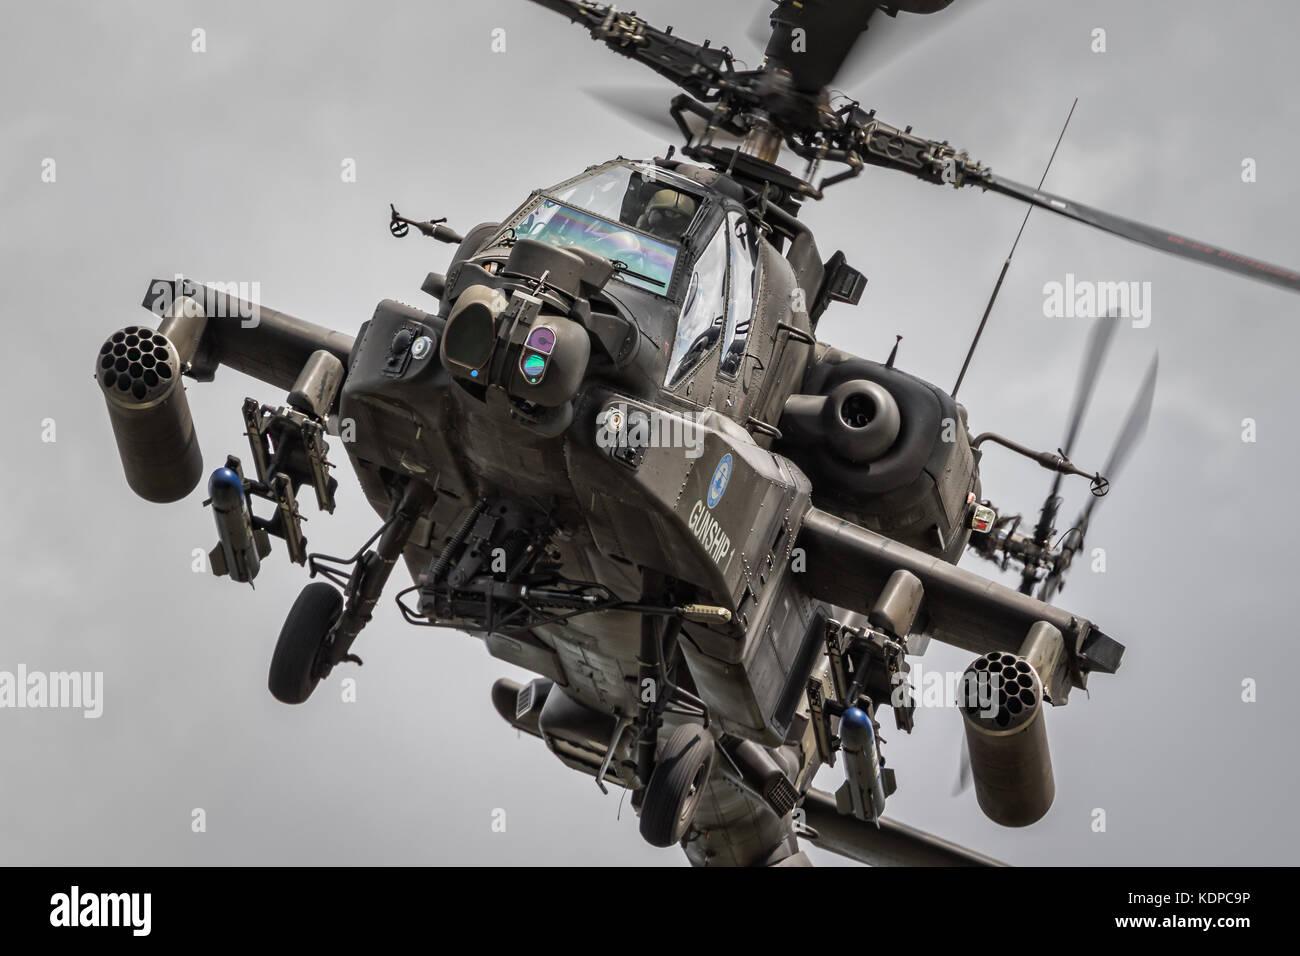 Apache Gunship  displaying at RIAT, Royal international Air Tattoo at RAF Fairford, England, UK - Stock Image